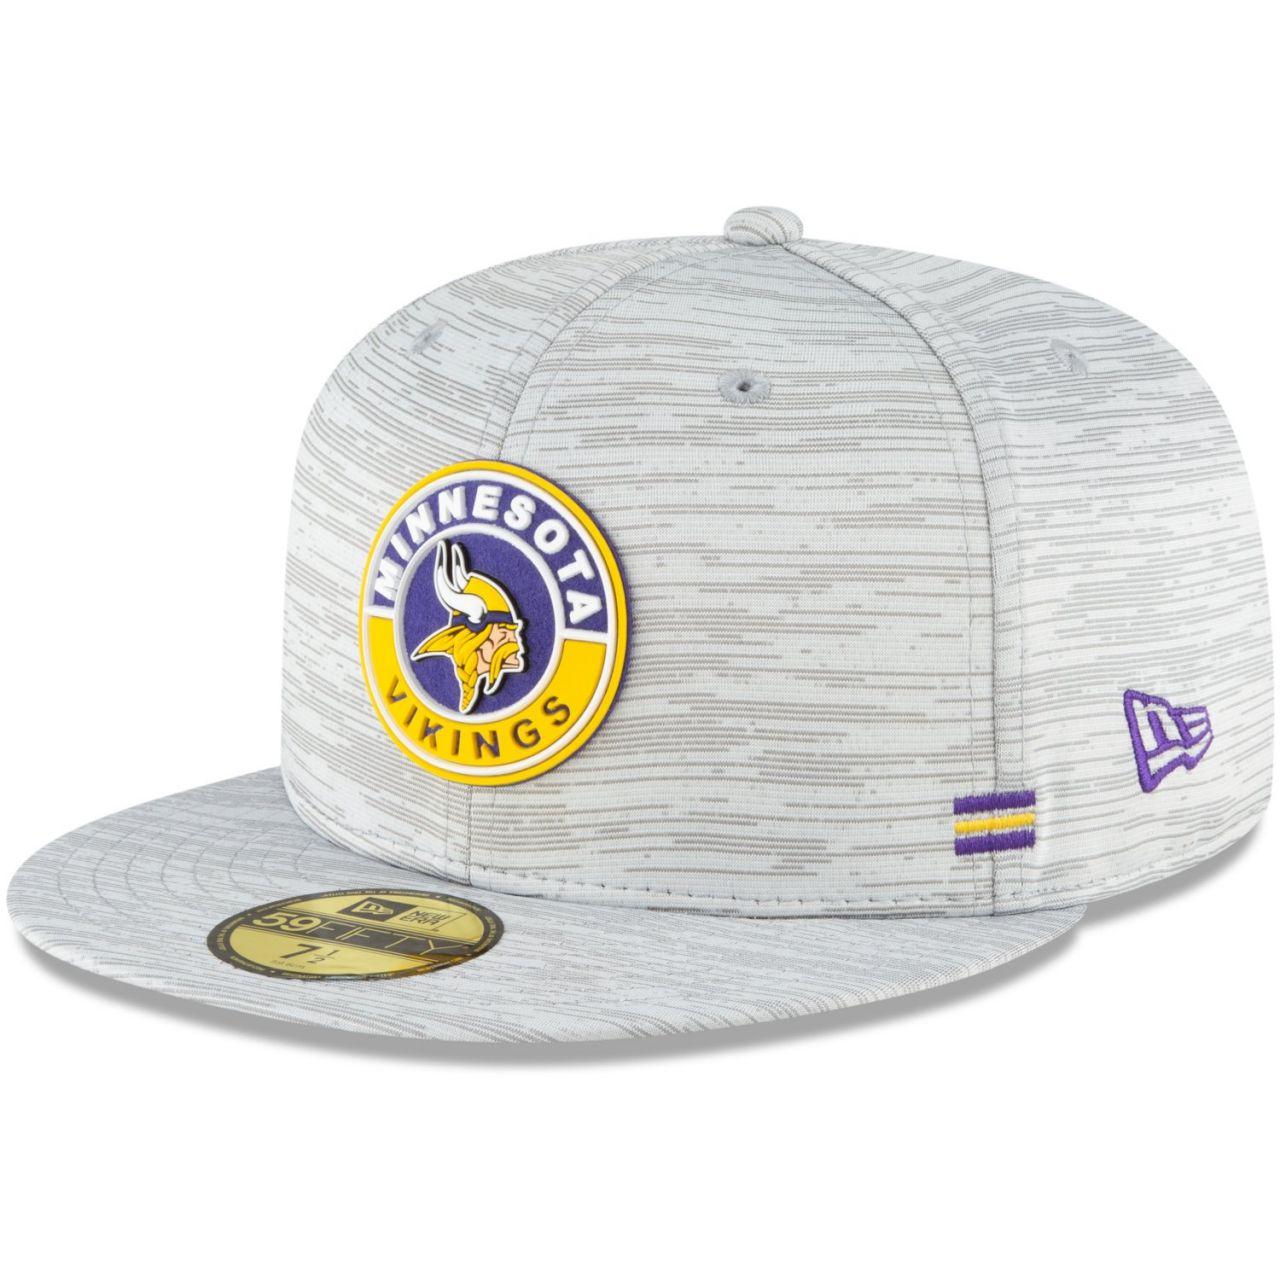 amfoo - New Era 59Fifty Fitted Cap - SIDELINE 2020 Minnesota Vikings